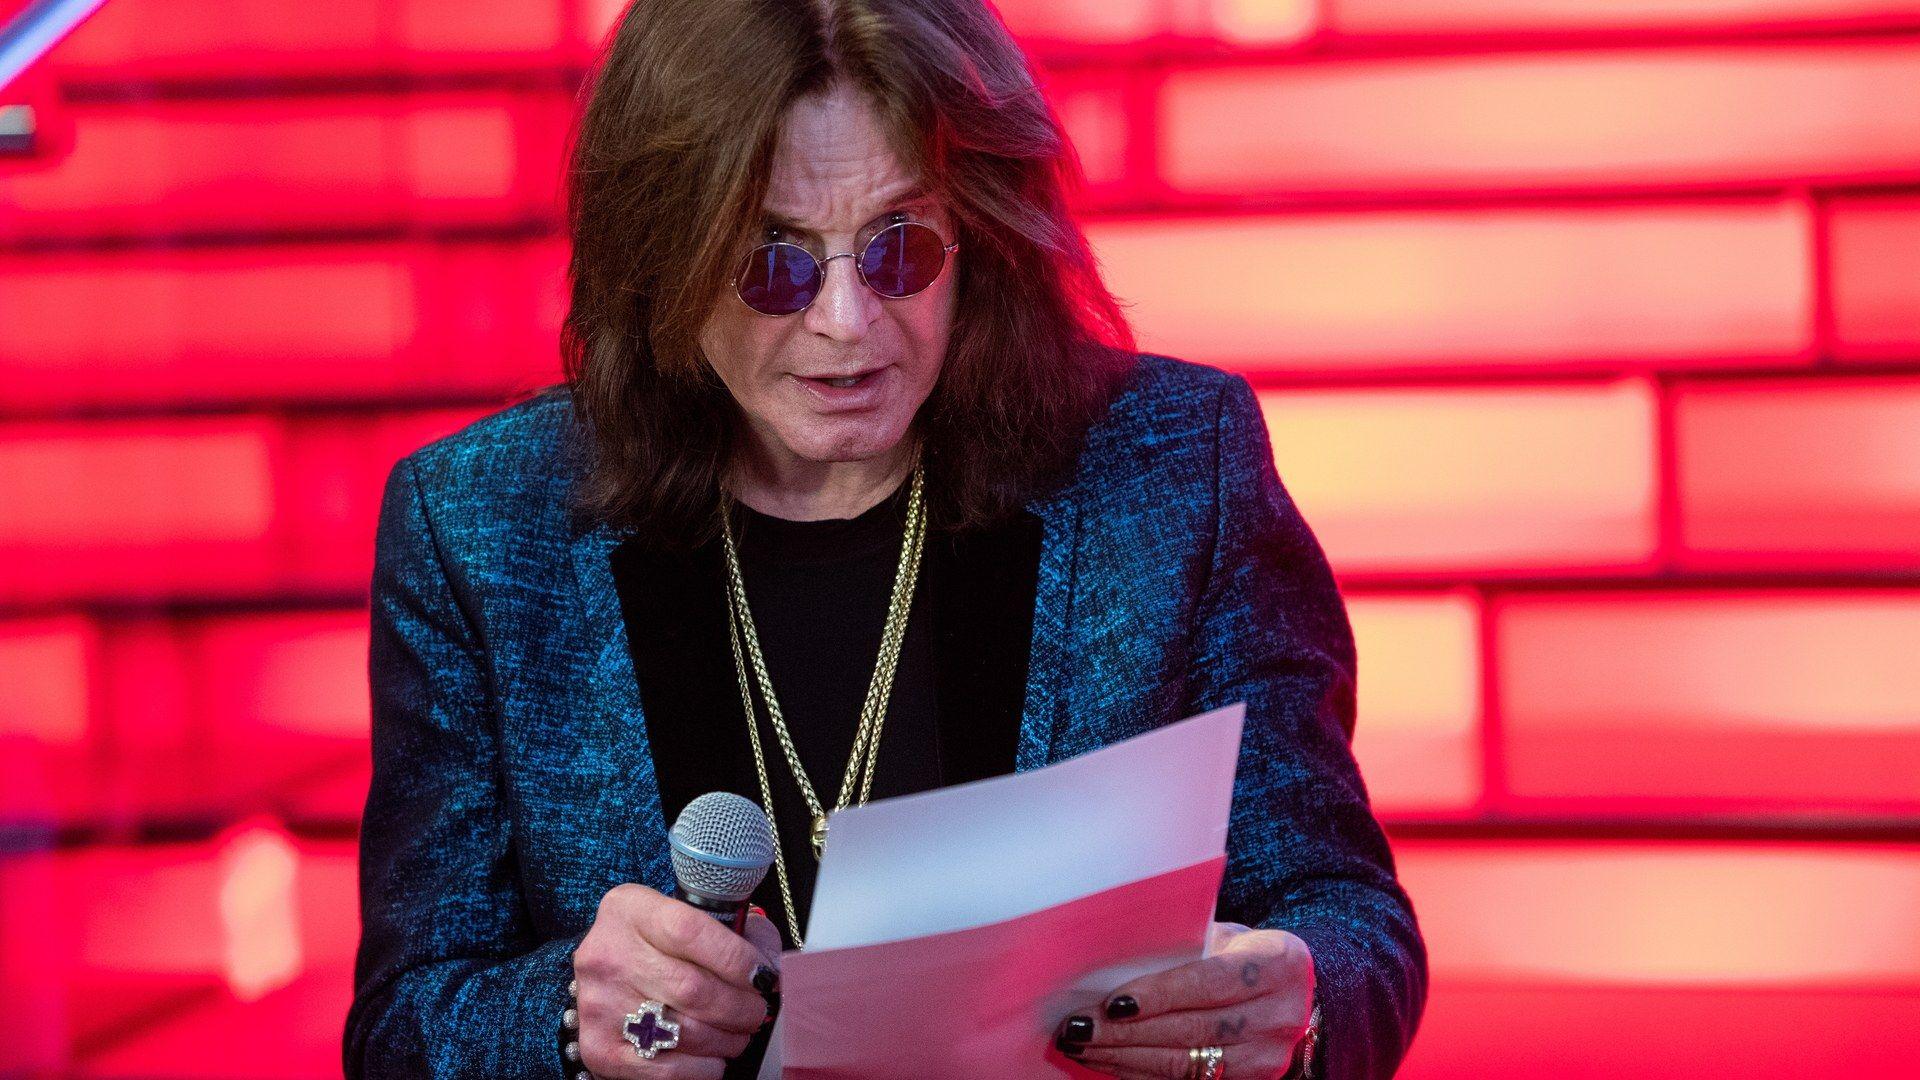 Ozzy Osbourne ha il Parkinson cos'è, sintomi e come si